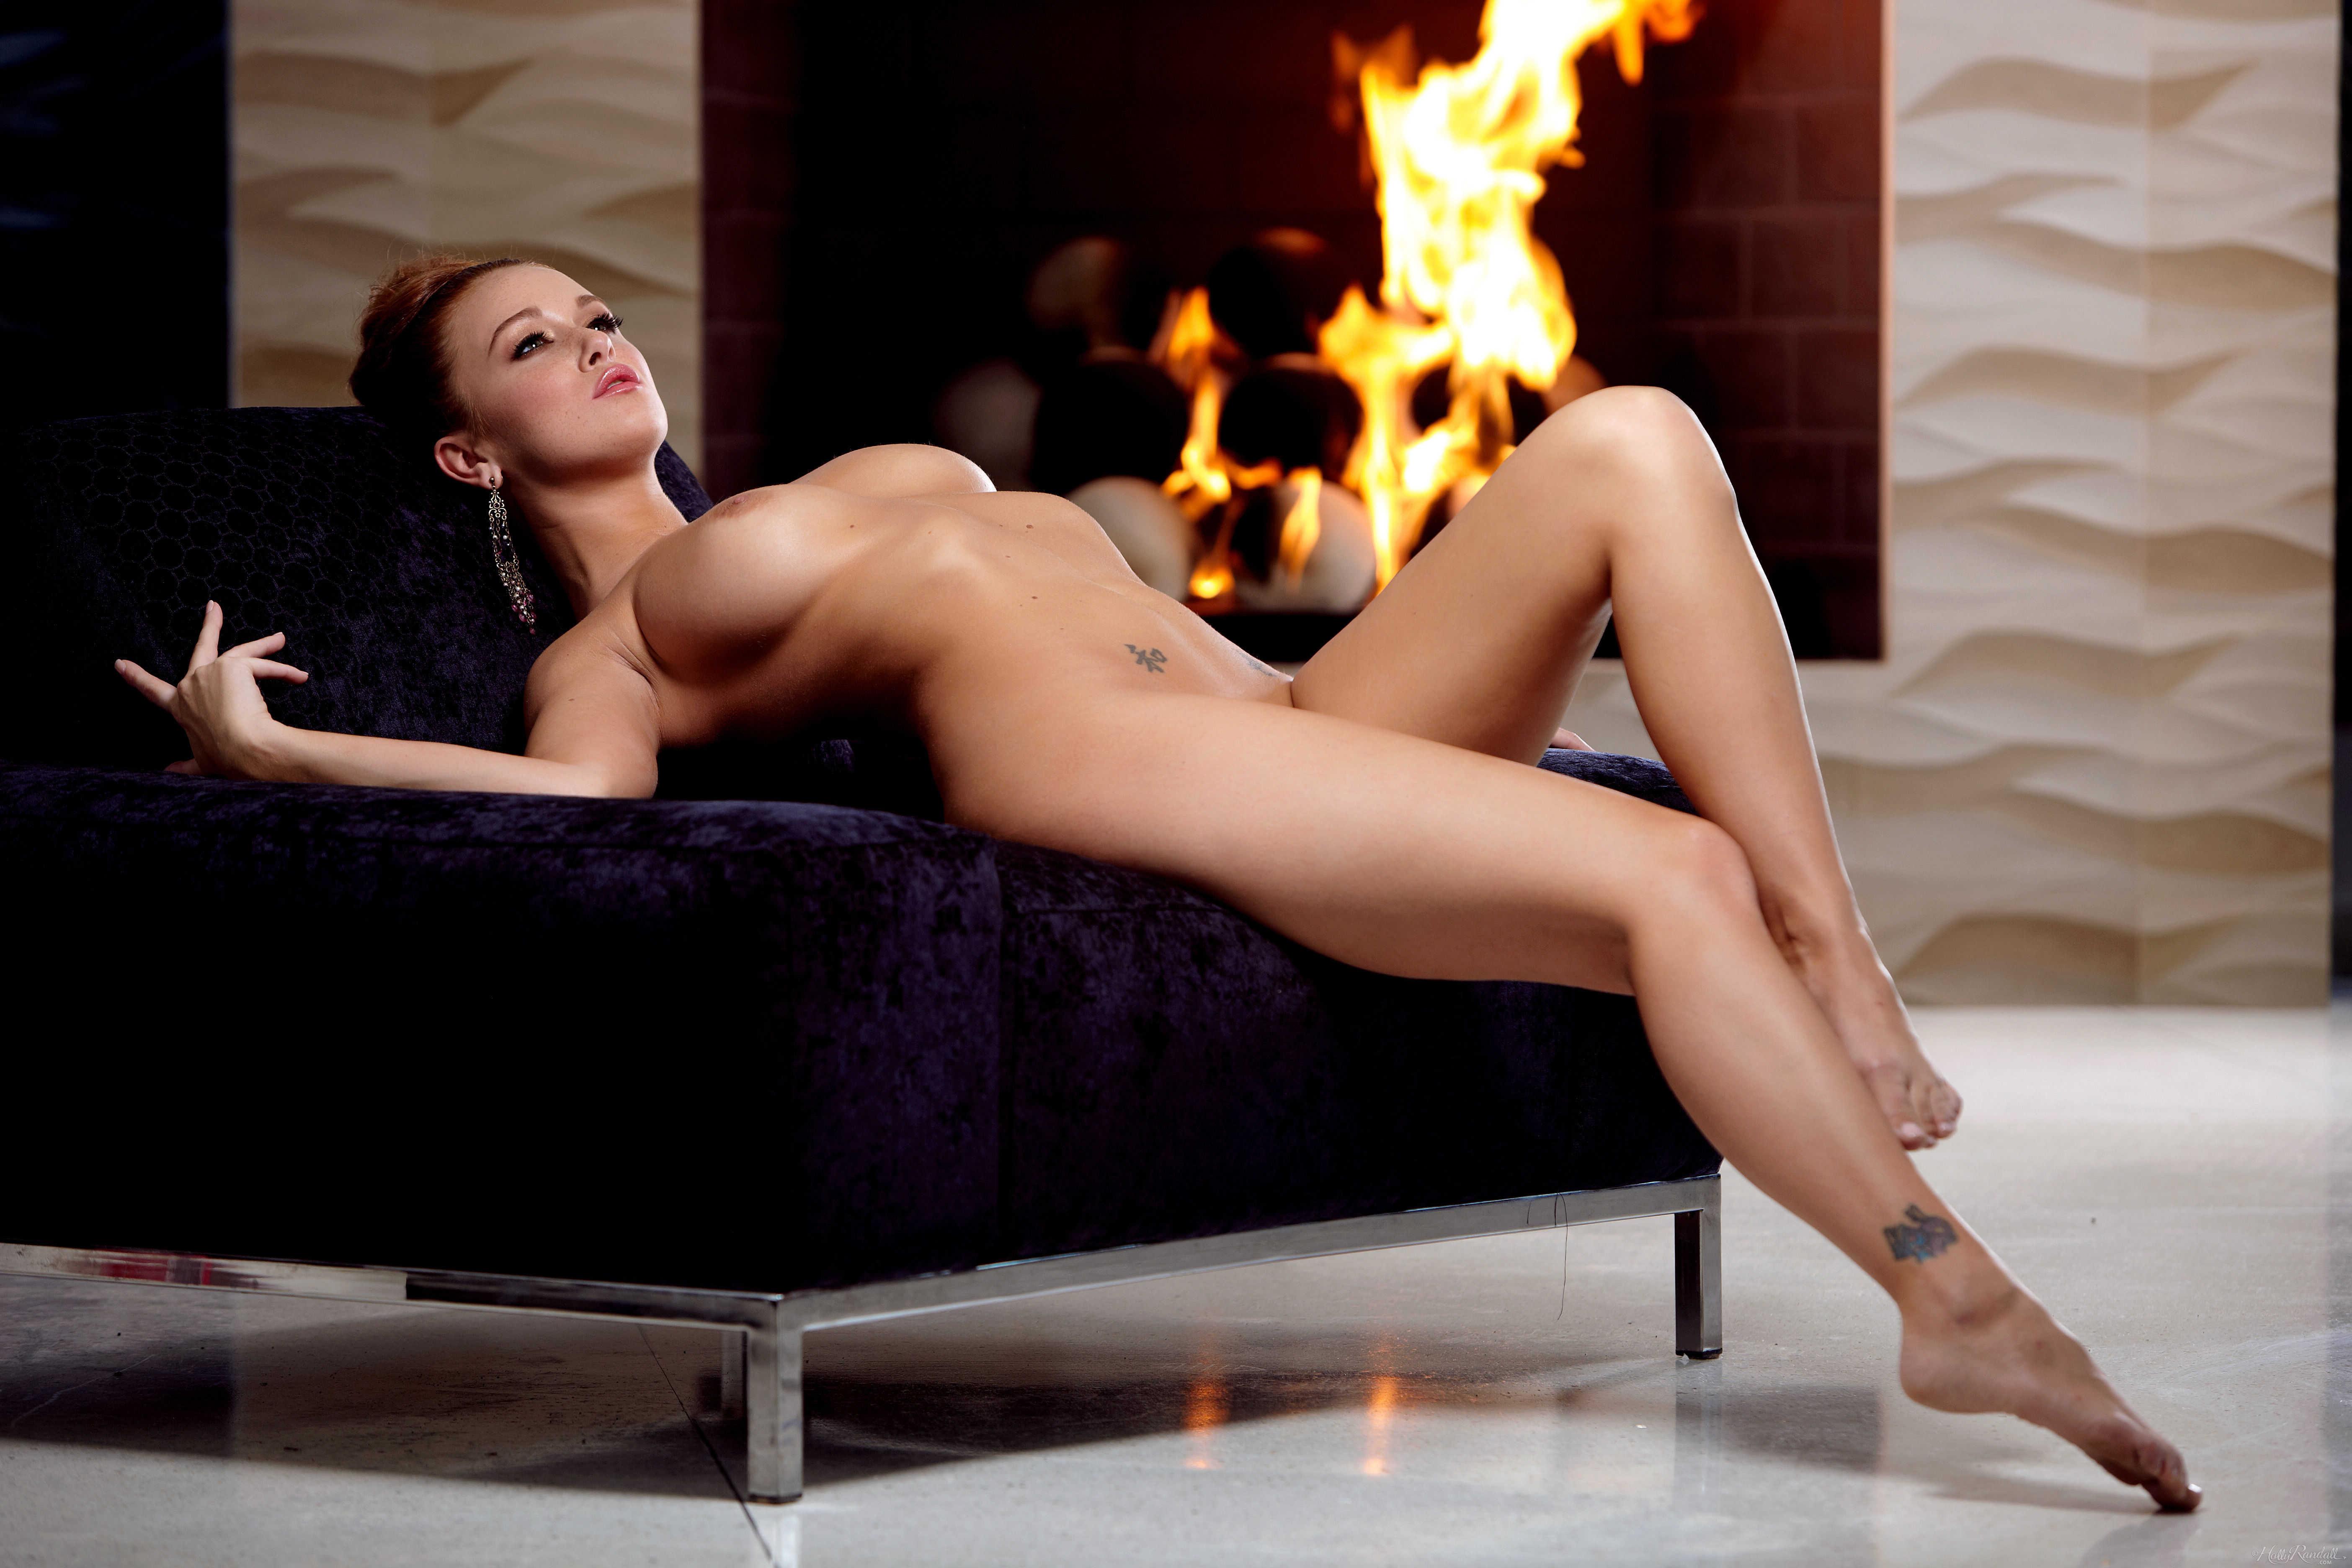 Wallpaper leanna decker, nude, fire, room, sexy, boobs ...